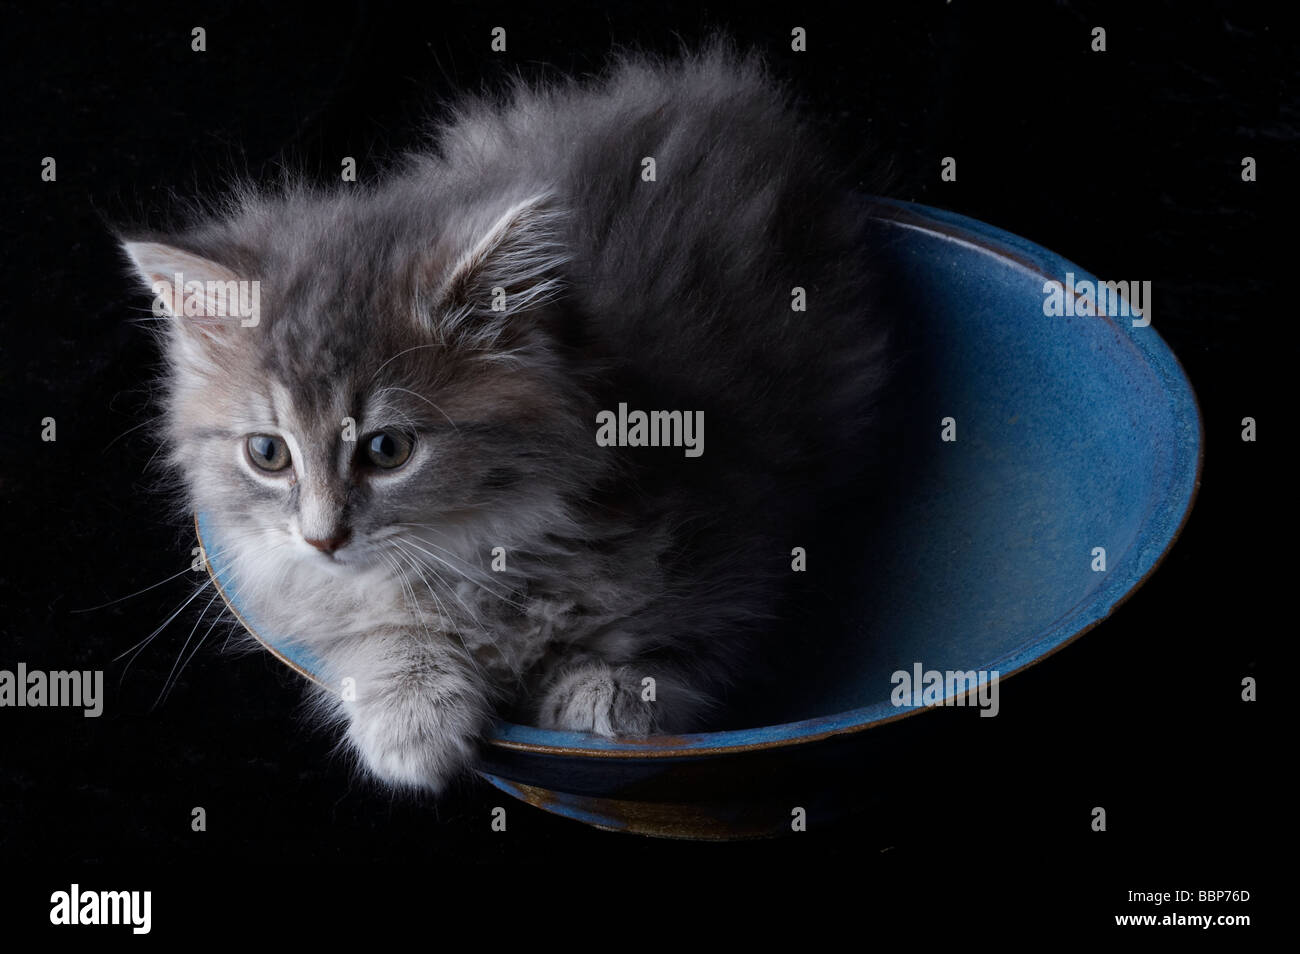 Fluffy grey kitten sitting in blue bowl - Stock Image